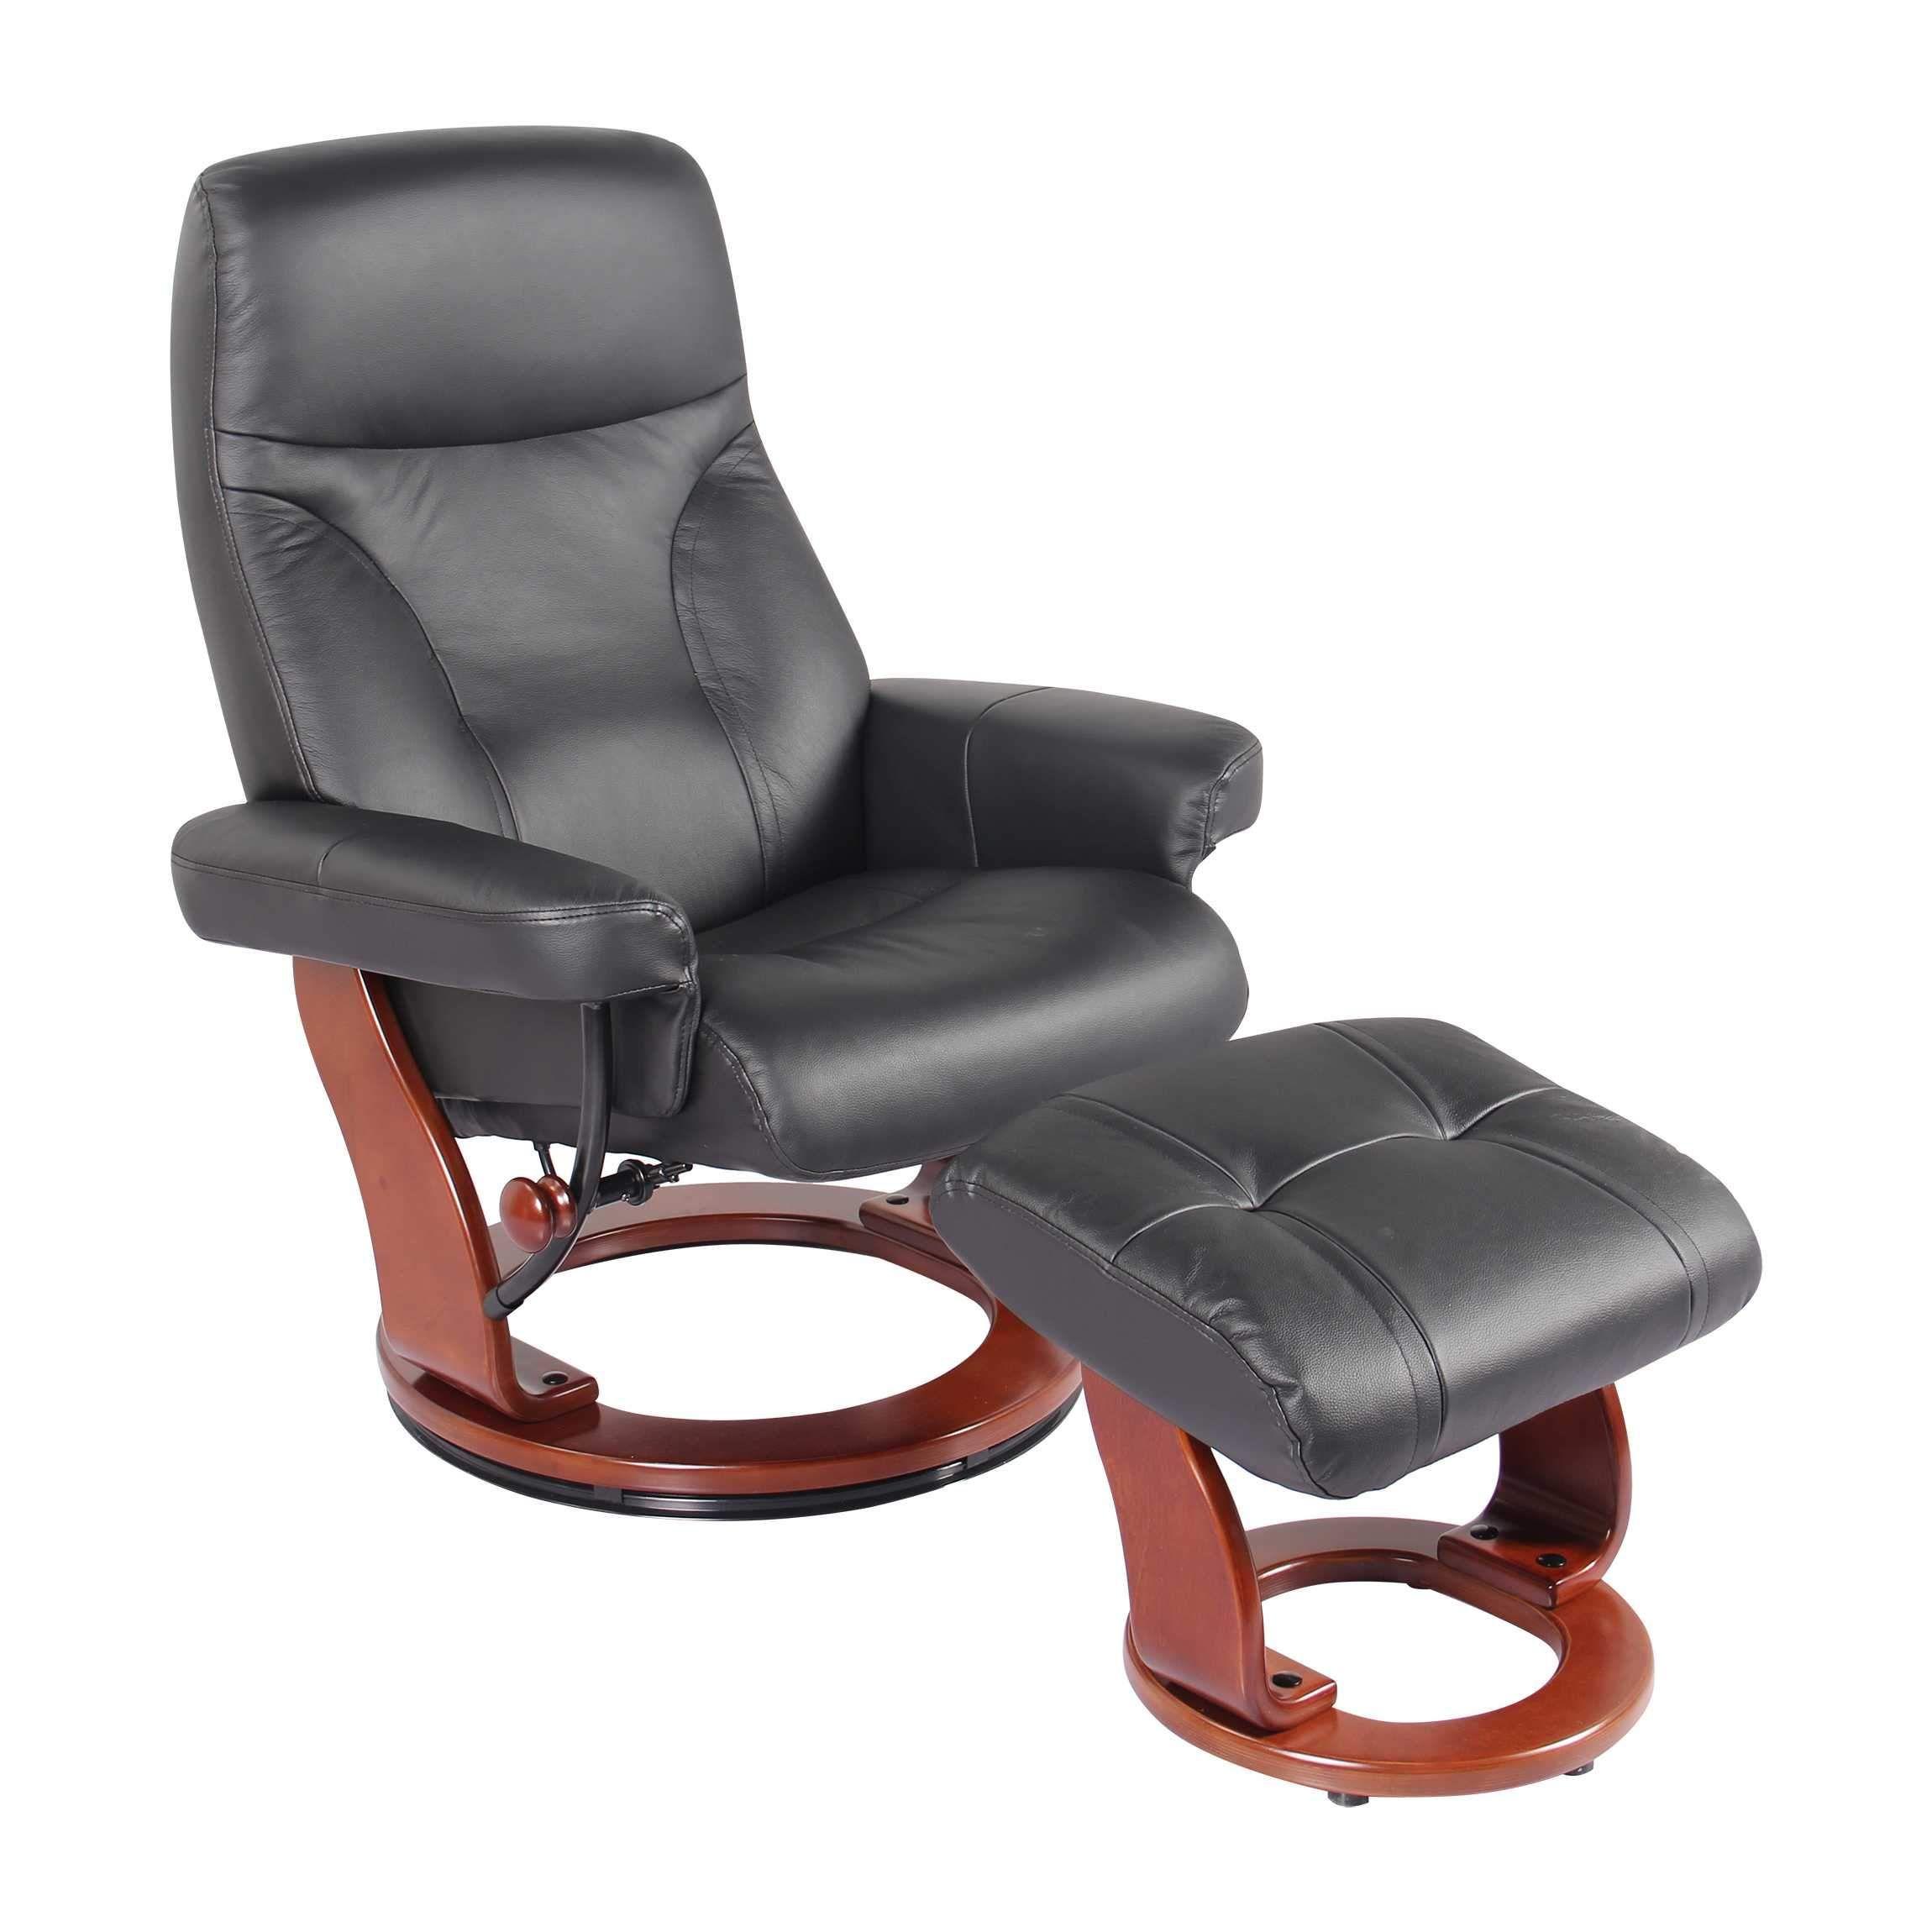 Black Chair & Ottoman Black Swivel recliner, Swivel